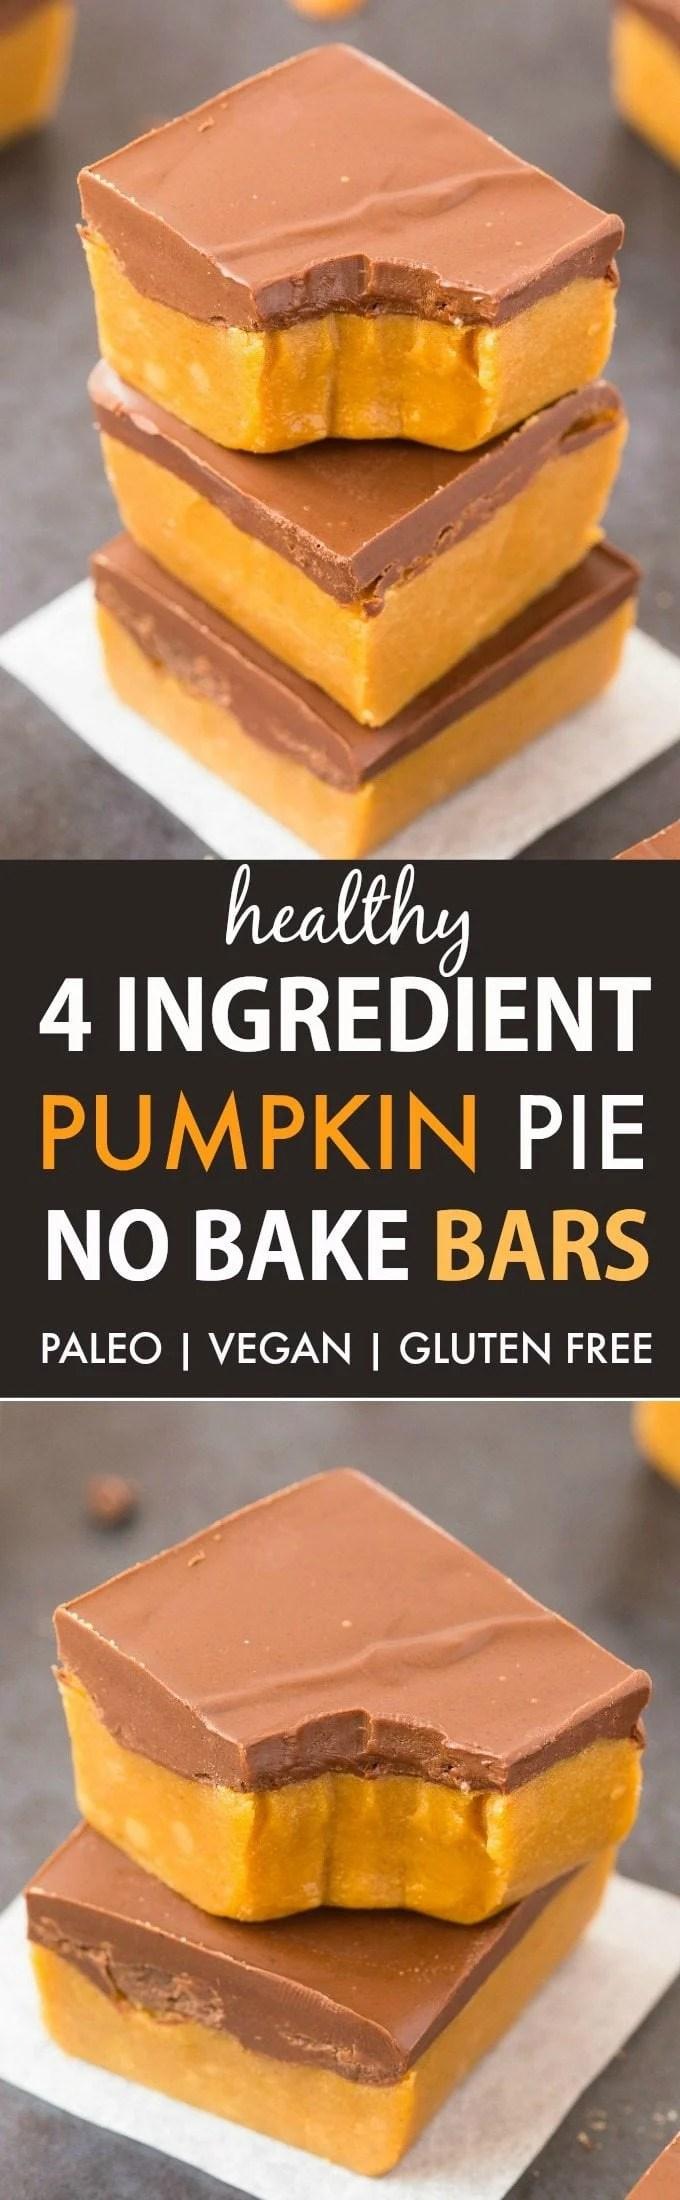 Healthy 4-Ingredient No Bake Pumpkin Pie Bars (V, GF, P)- an easy recipe for thick, gooey pumpkin pie bars that taste like dessert but is healthy and protein-packed! {#vegan, gluten free, #paleo recipe}- thebigmansworld.com #pumpkinpie #nobake